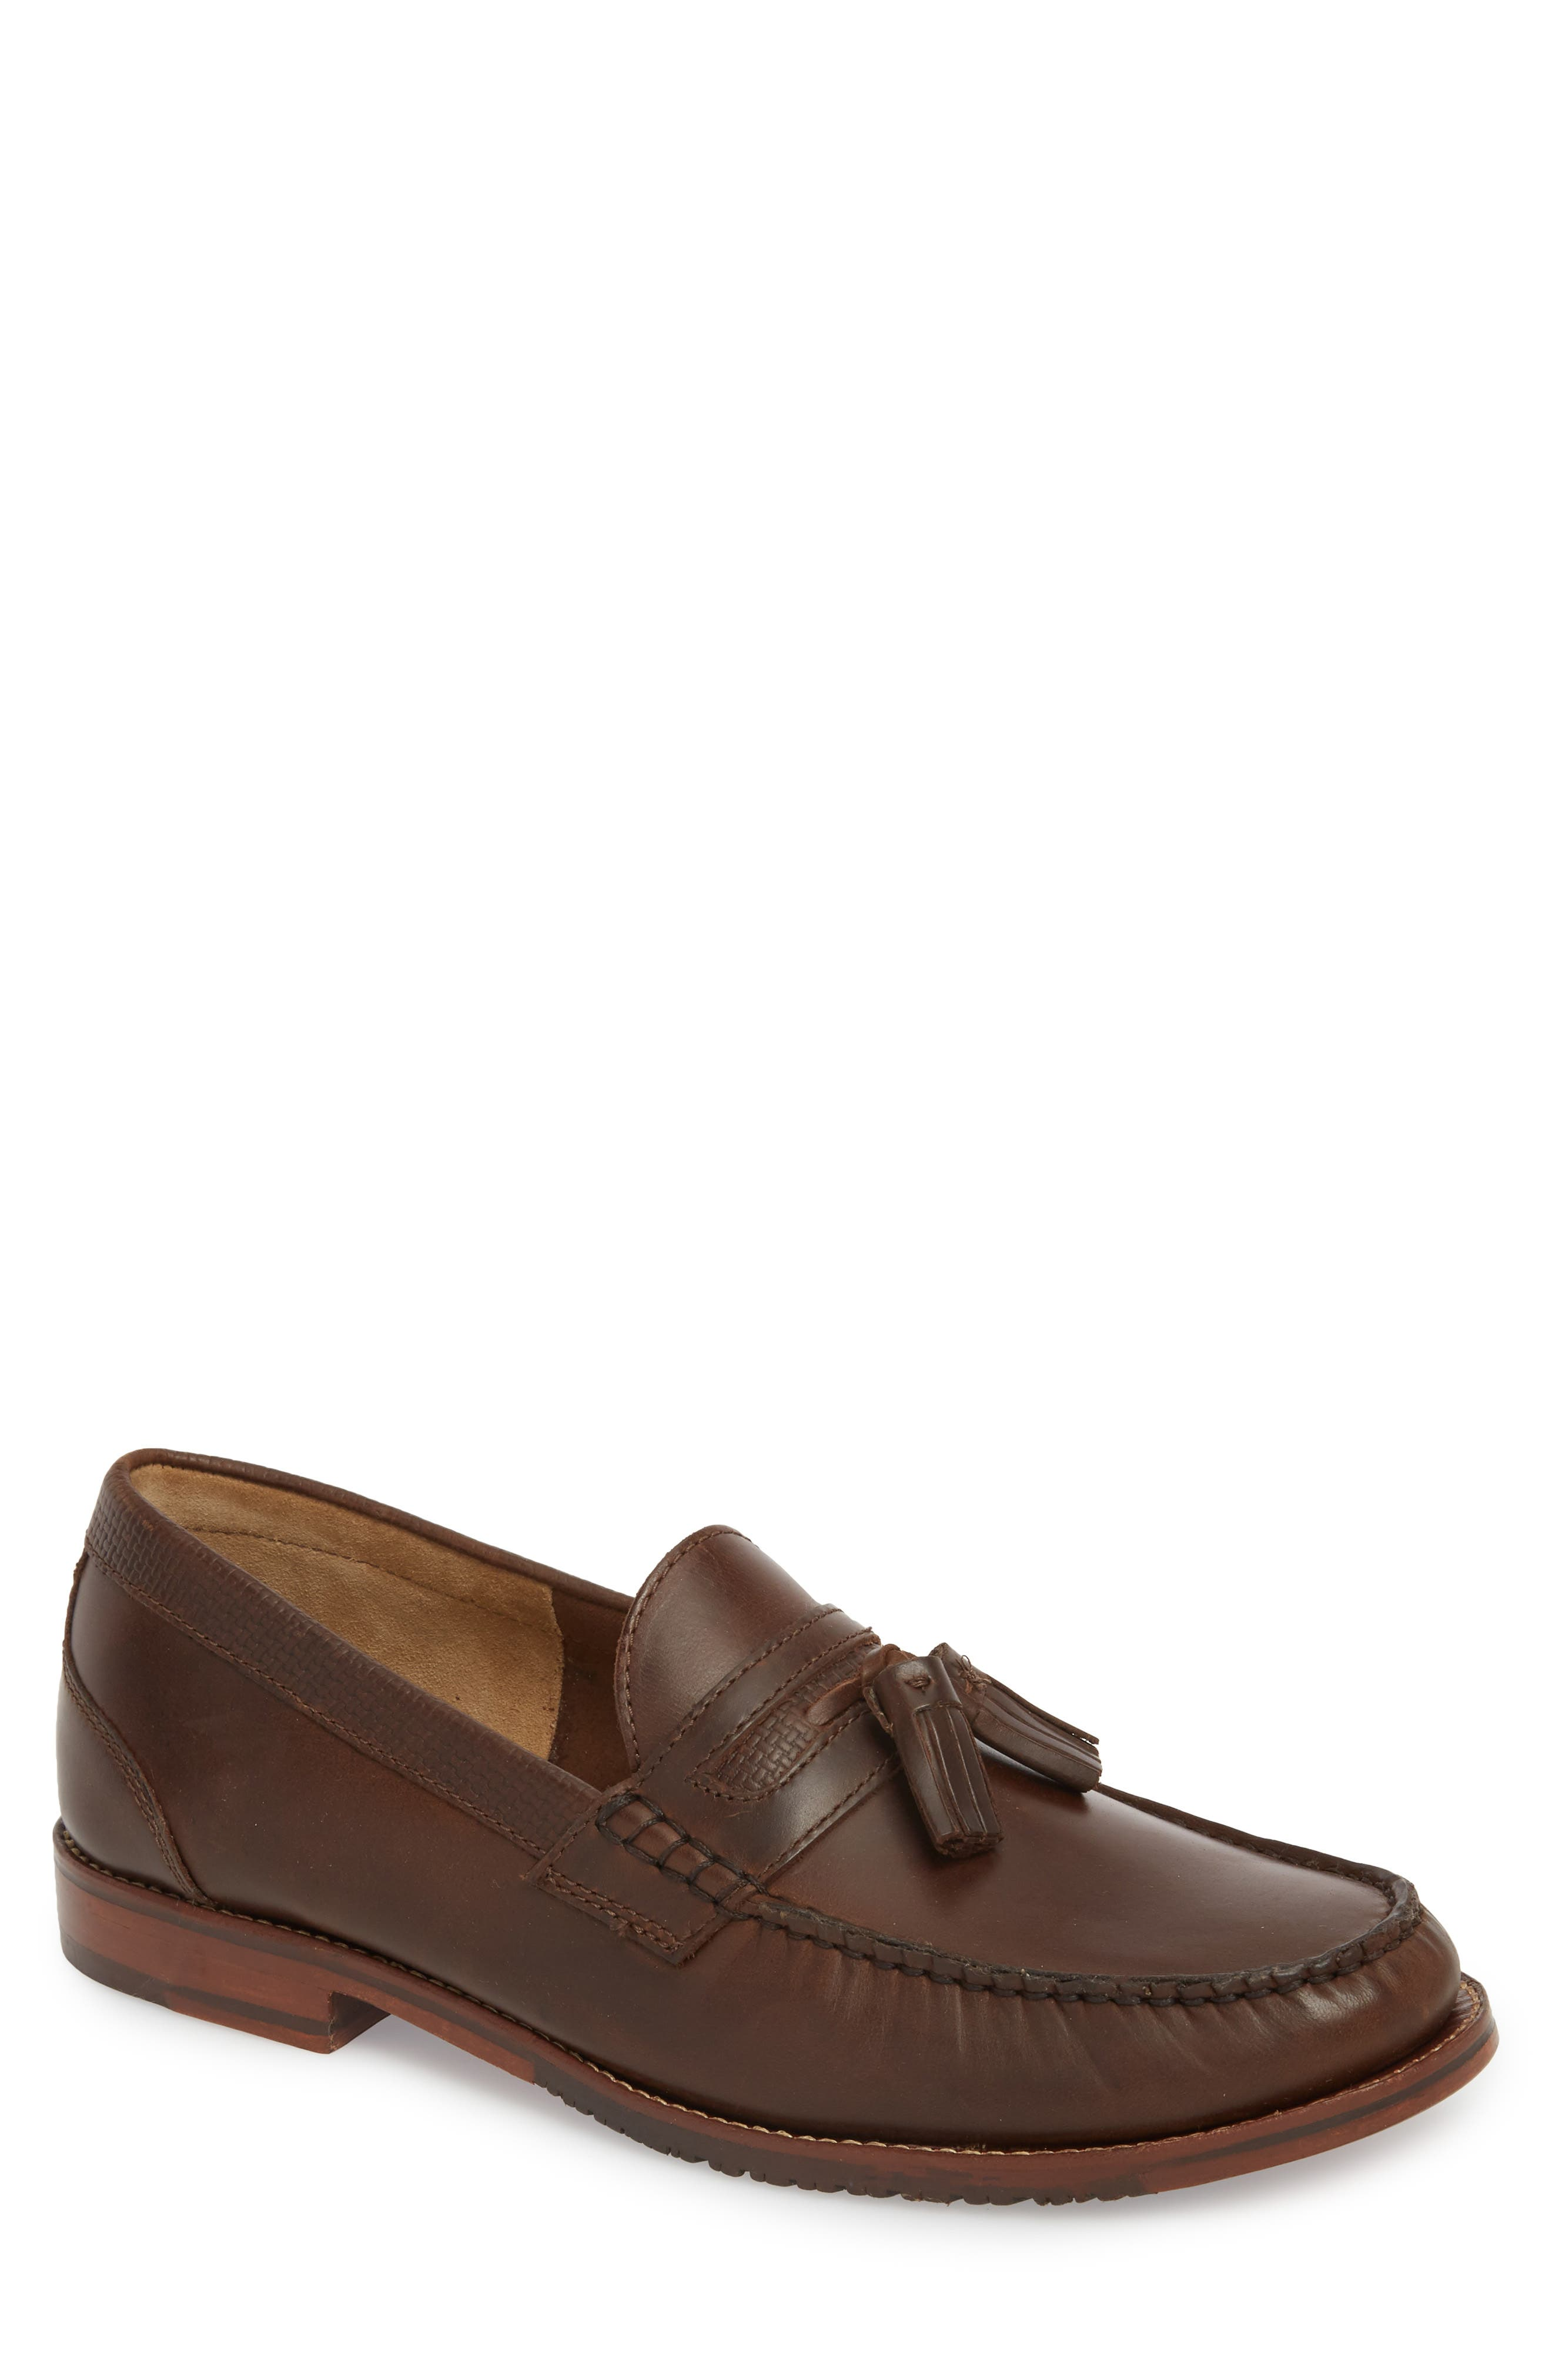 Tasslington Loafer,                             Main thumbnail 1, color,                             Dark Brown Leather